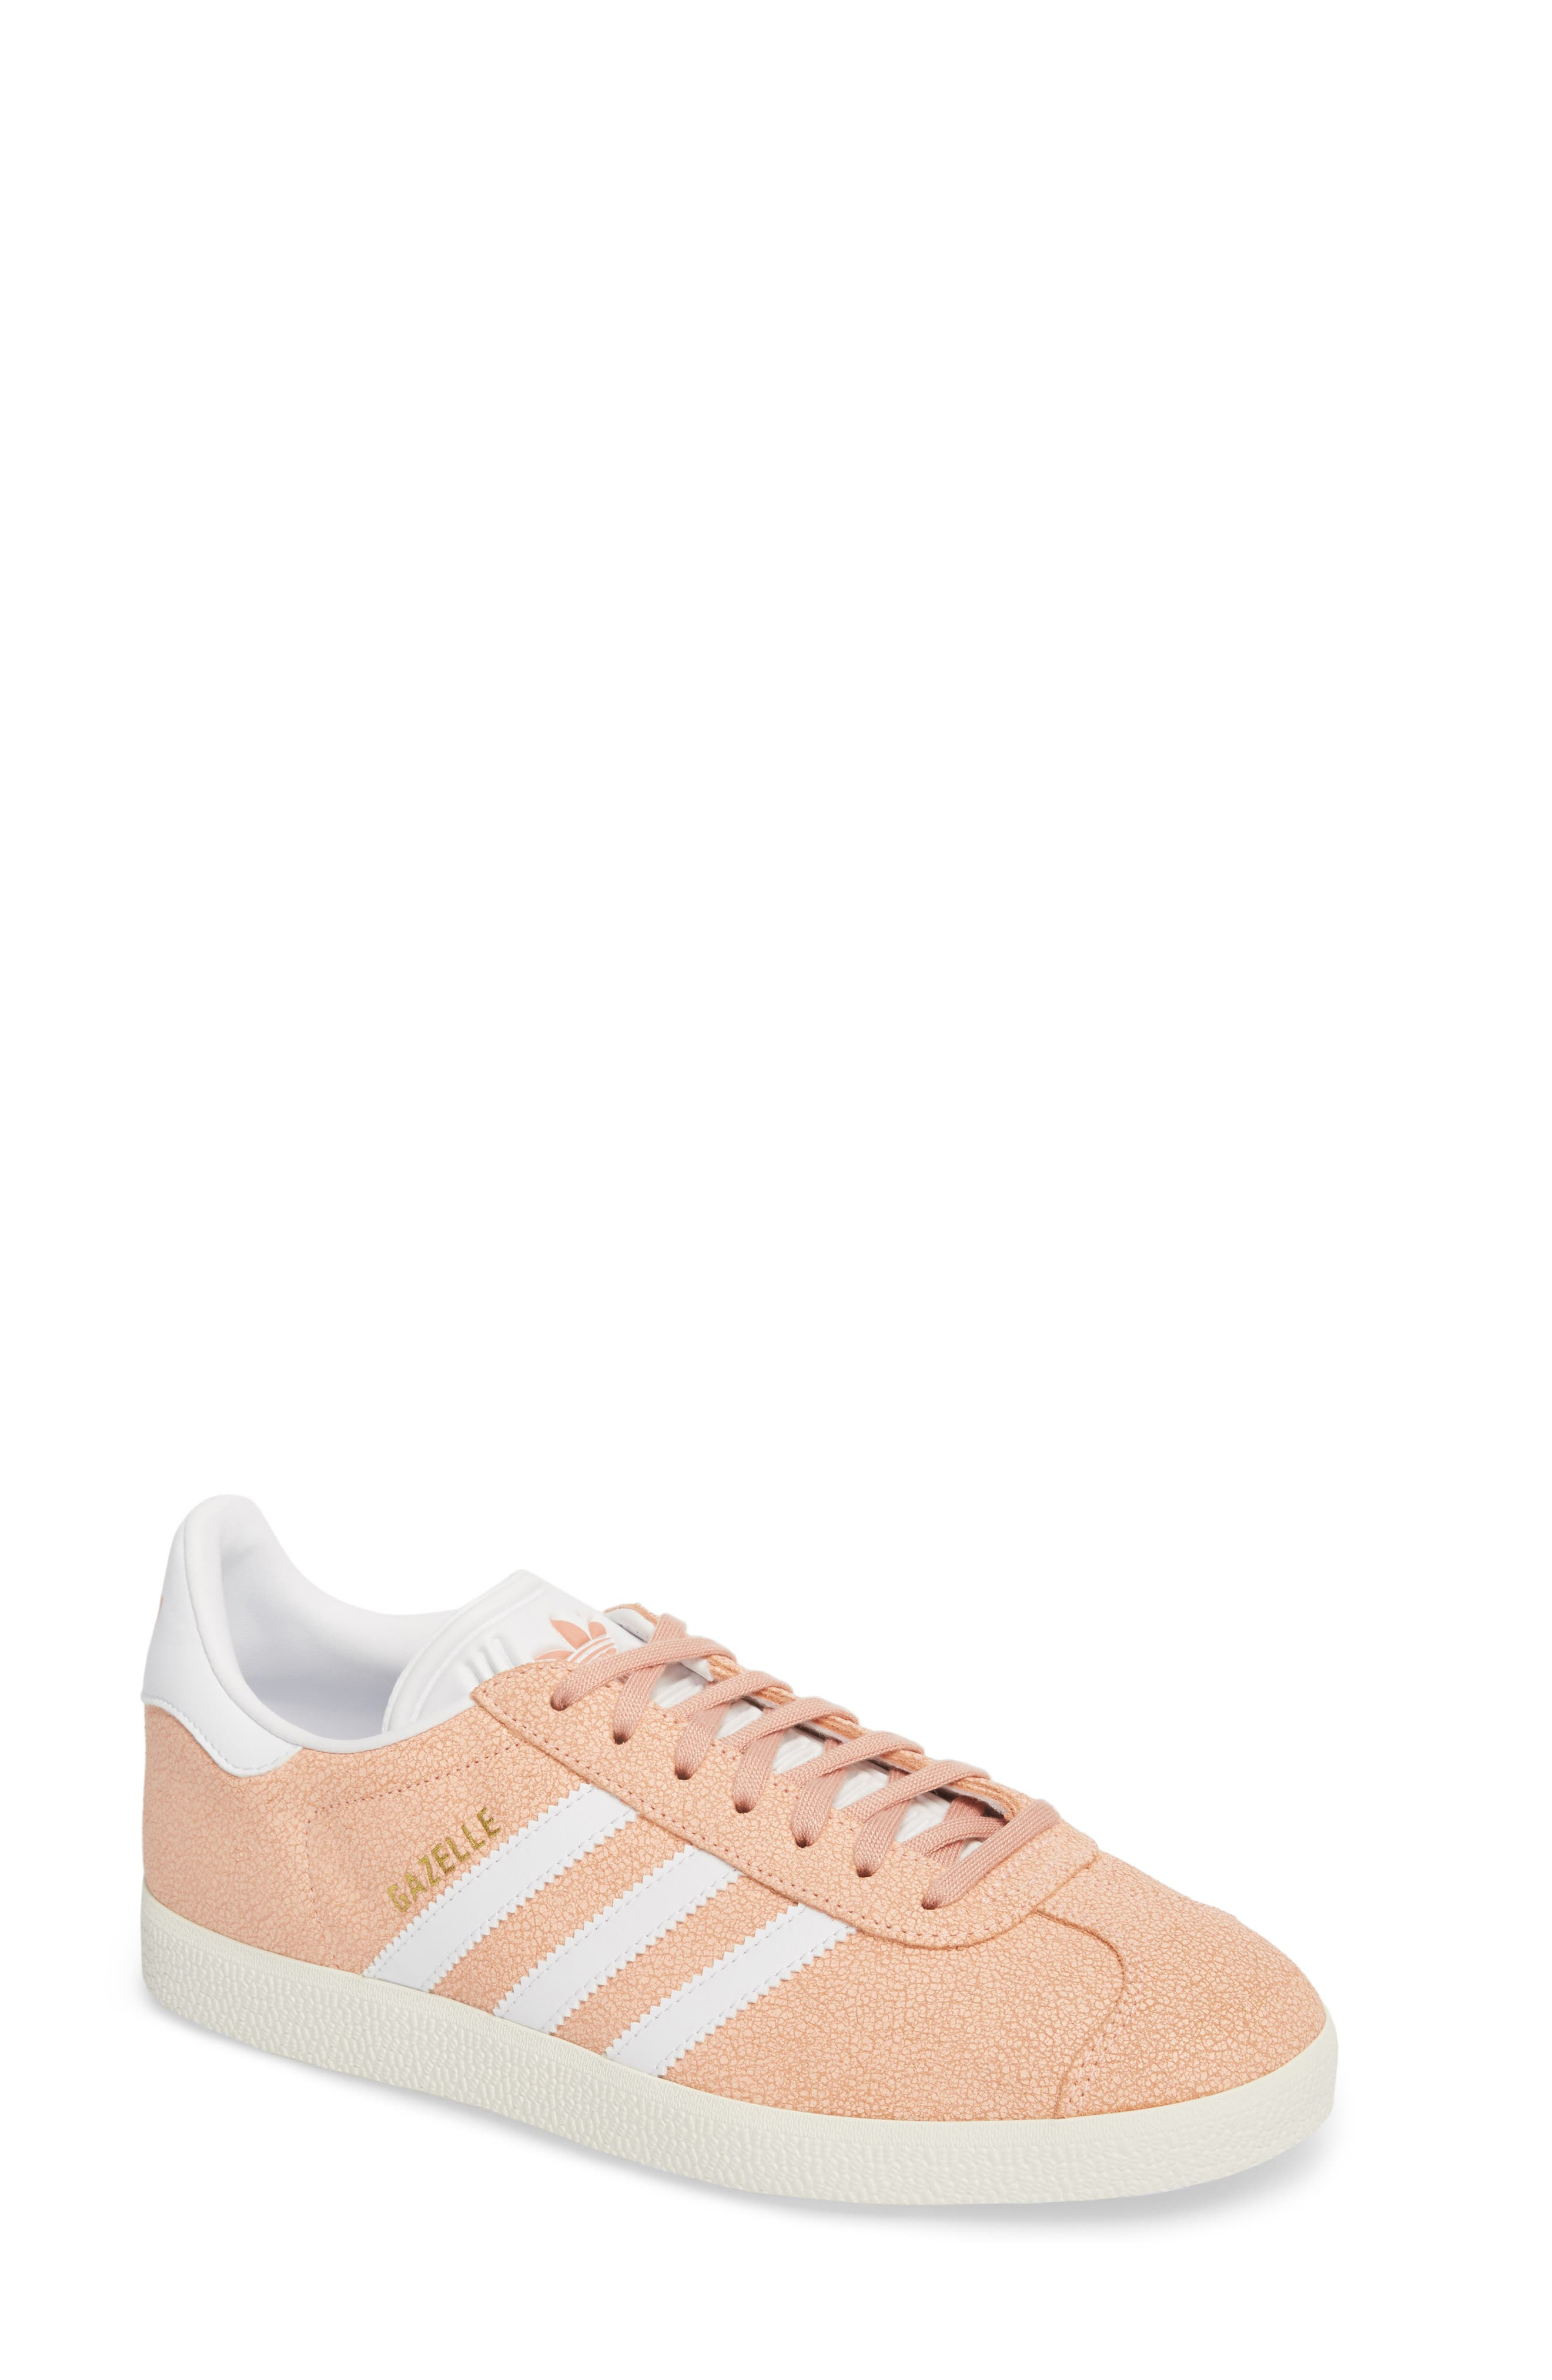 Gazelle Sneaker,                         Main,                         color, Clear Orange/ White/ Off White